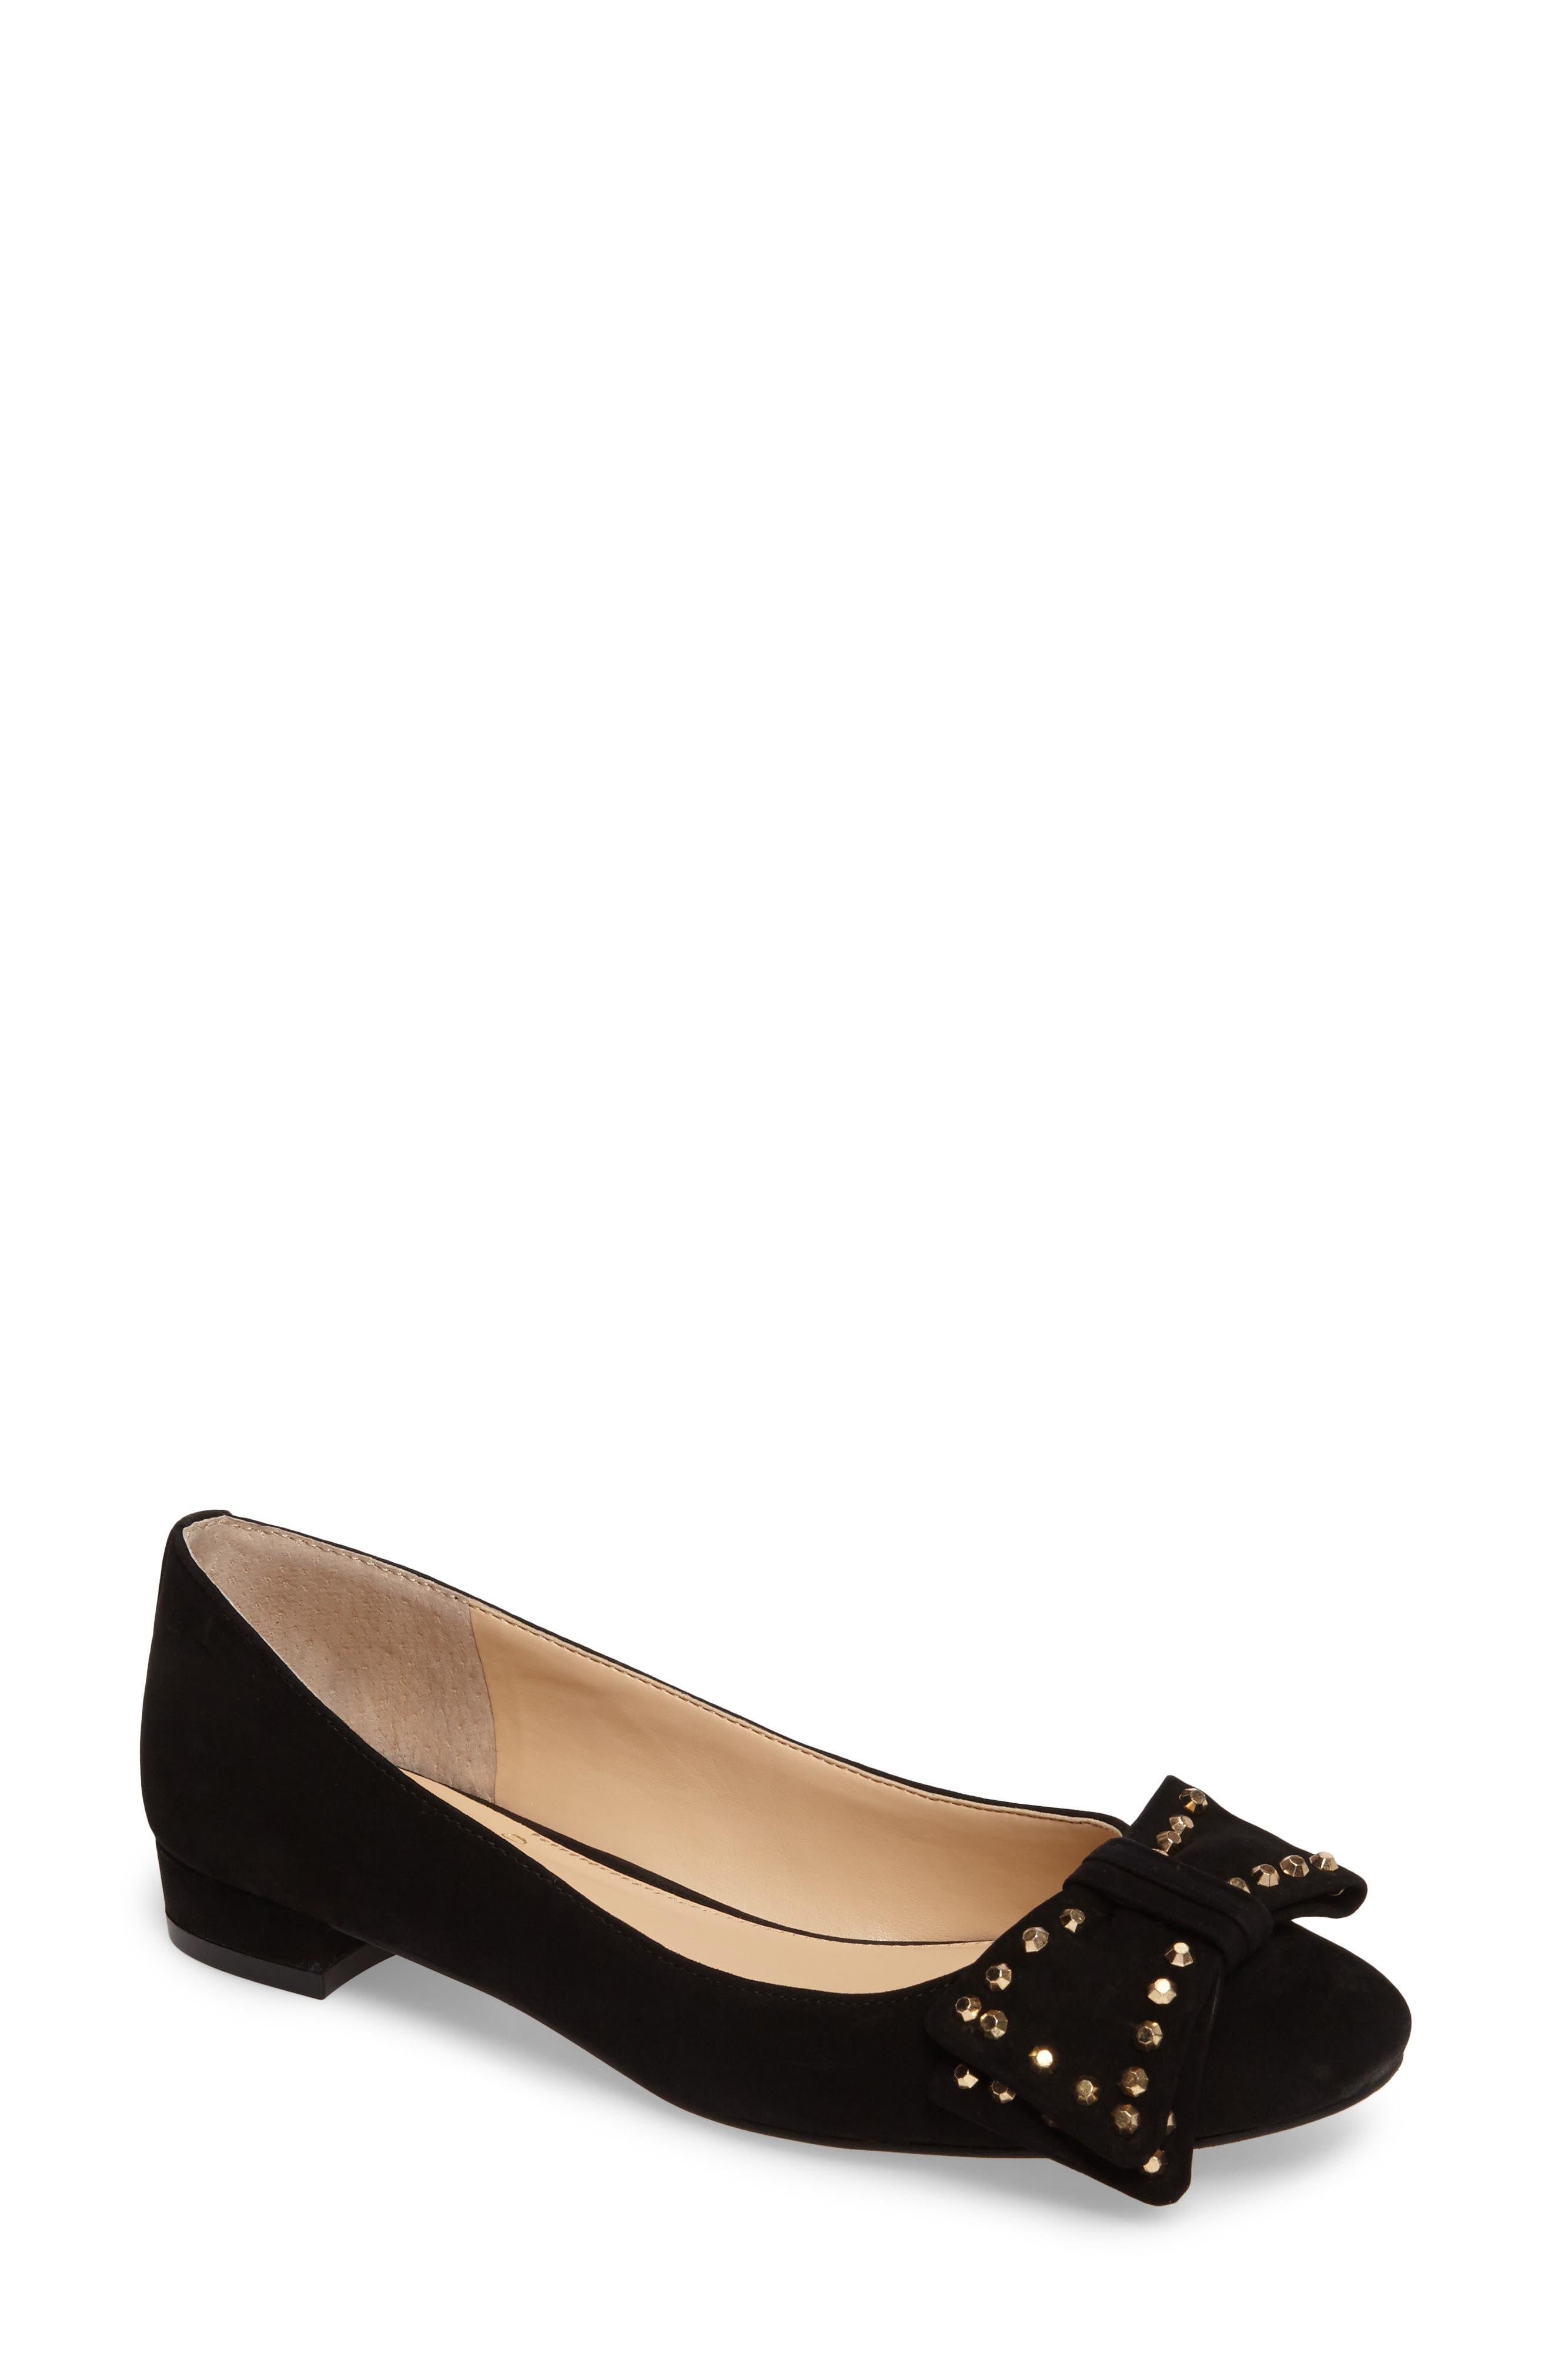 Annaley Flat,                         Main,                         color, Black Nubuck Leather